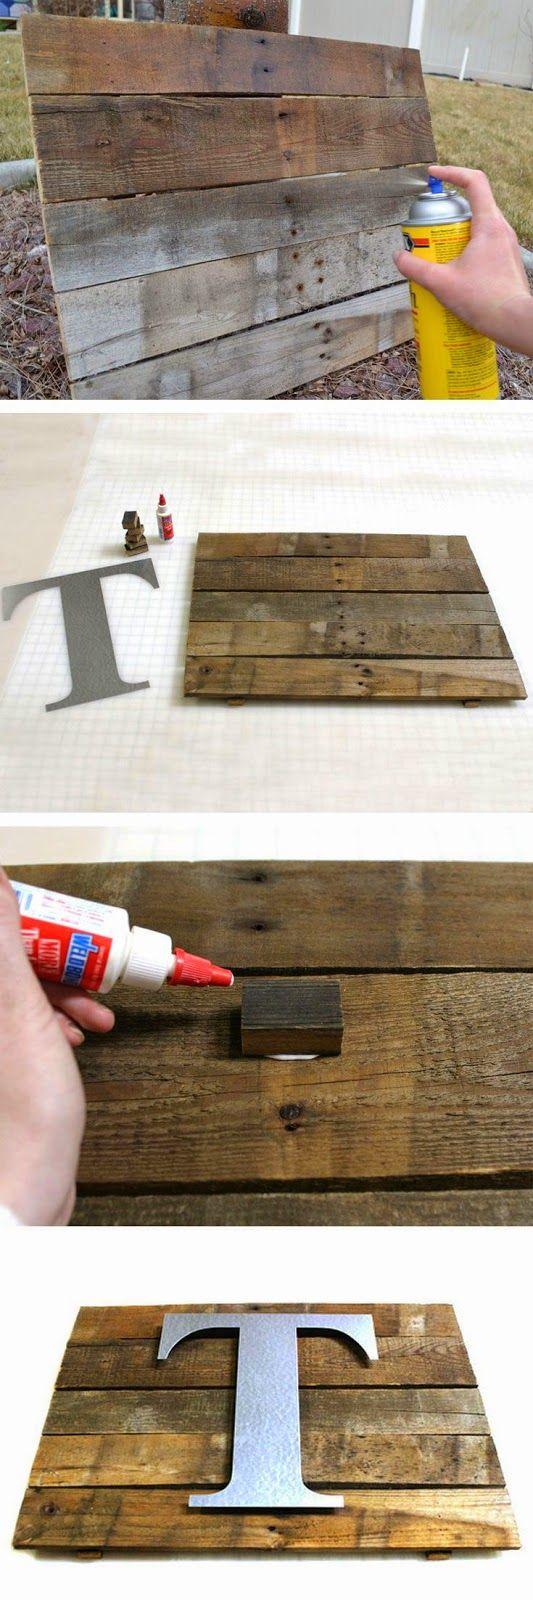 DIY Rustic Coat Rack DIY Rustic Pallet Wall Plaque DIY Rustic Wall Art Ideas  DIY Windows Decorating ...